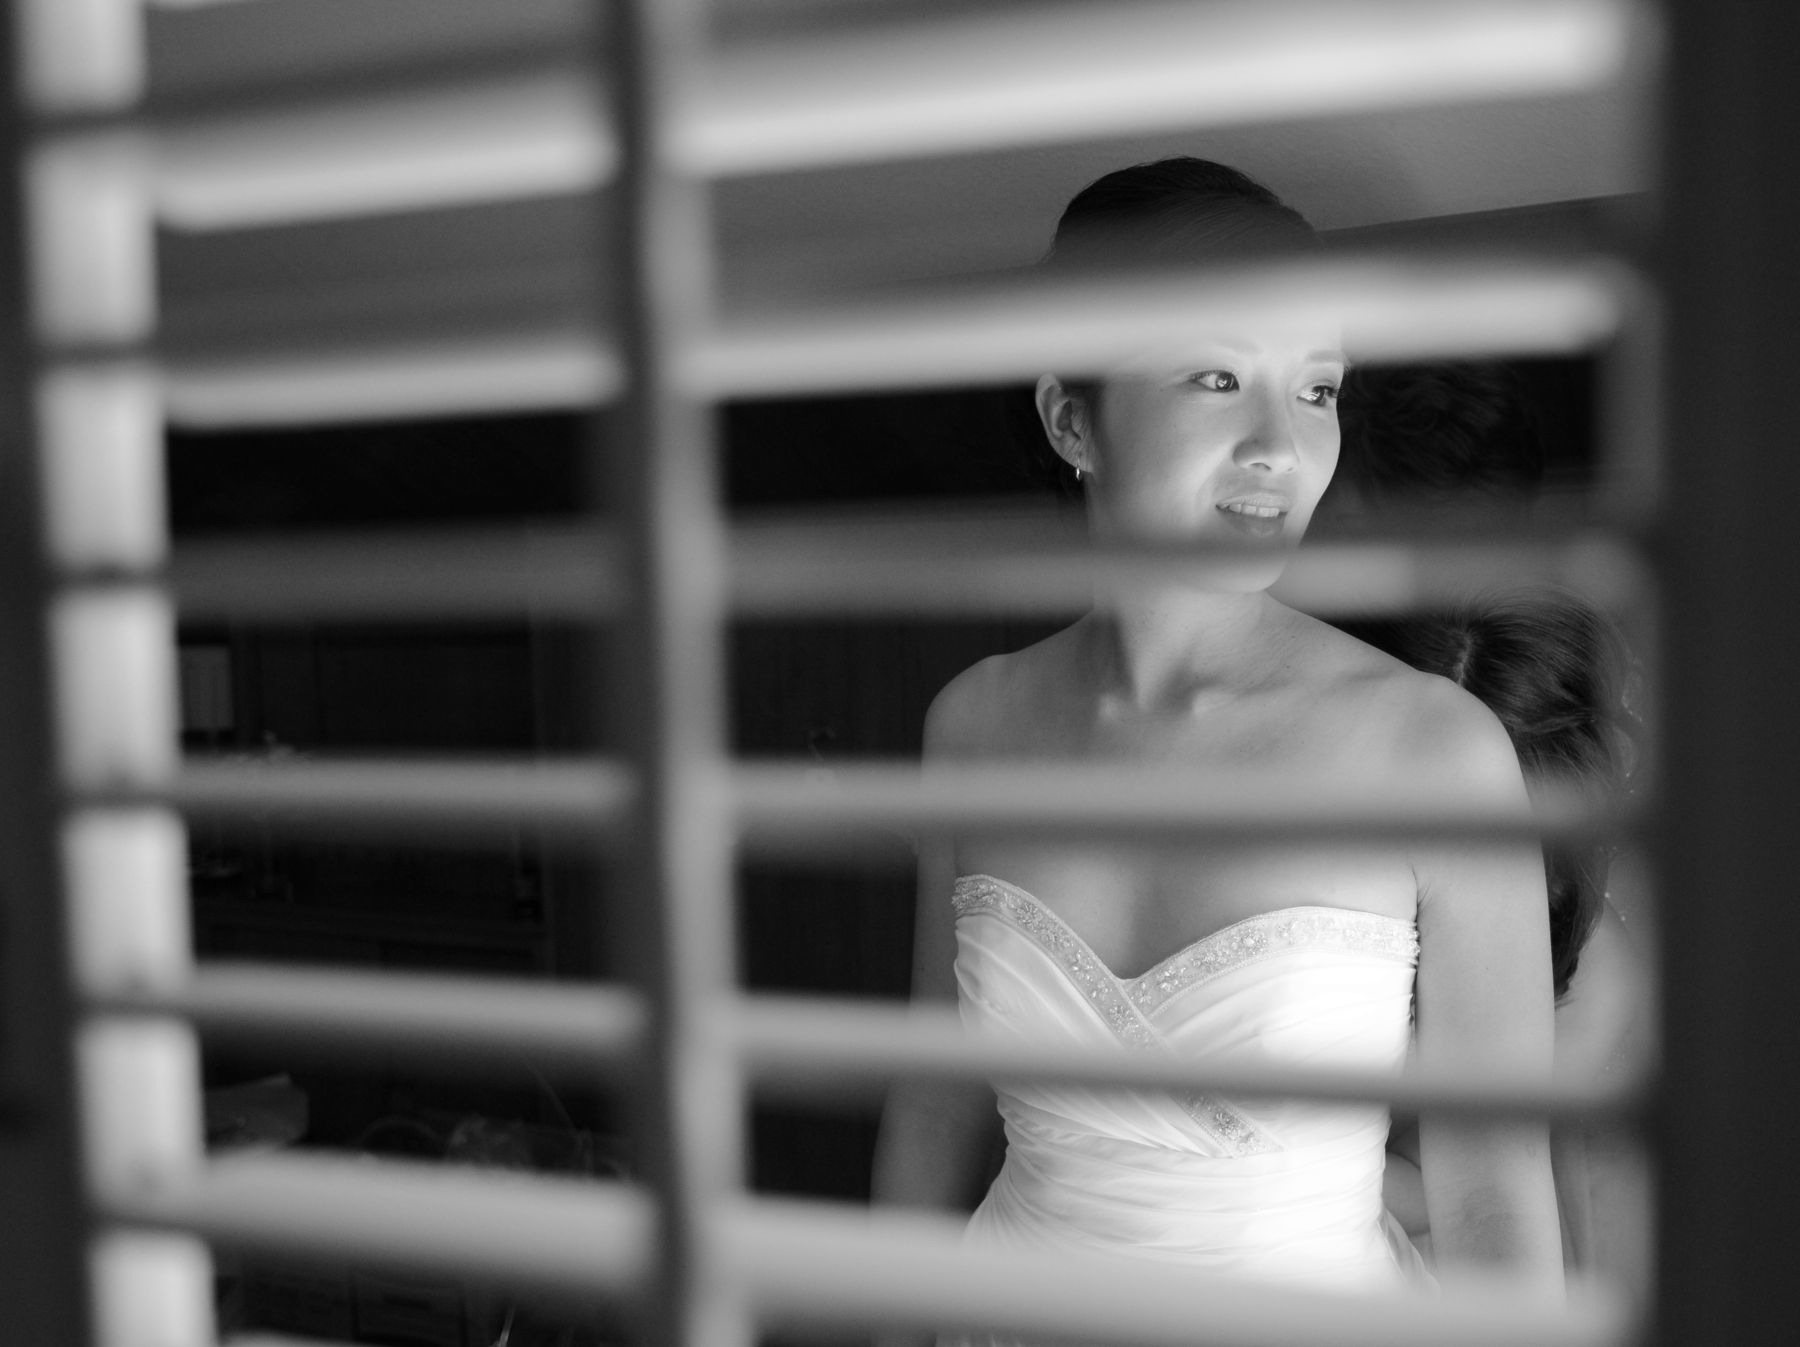 San Francisco Bay Area Gay artistic Destination Wedding Photographer Image / Photo